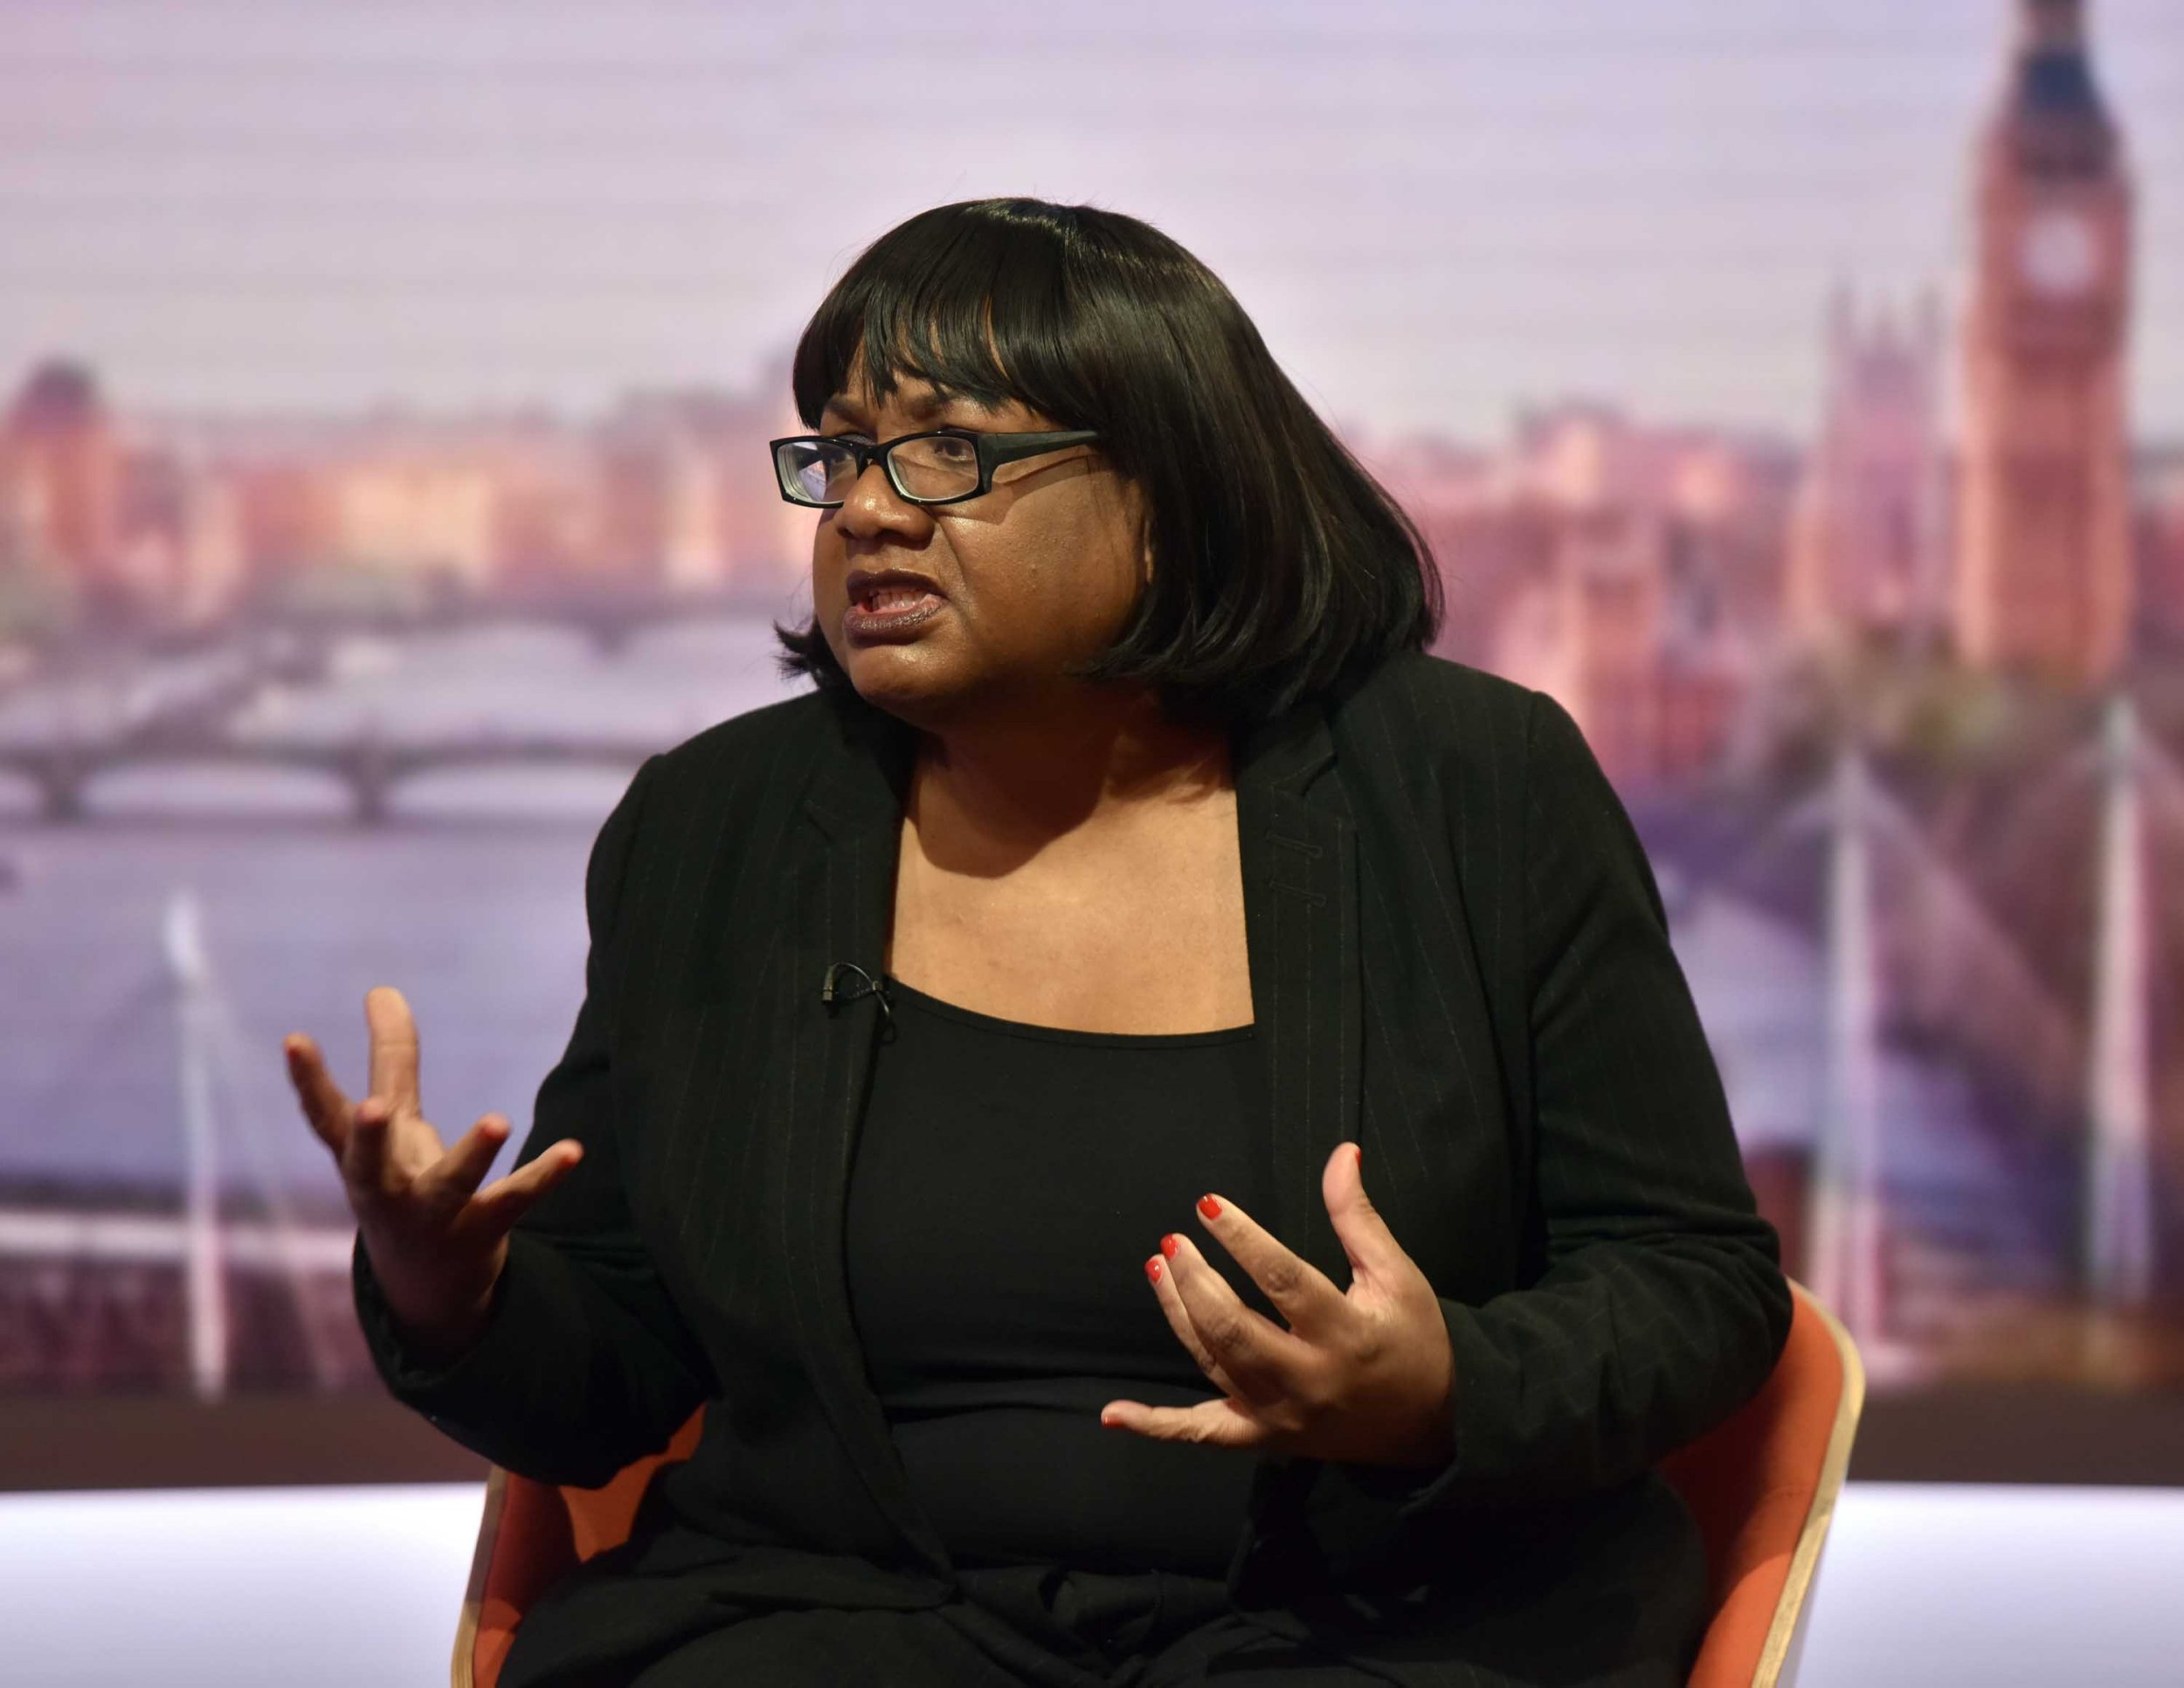 Diane Abbott wades in on Labour's anti-Semitism row